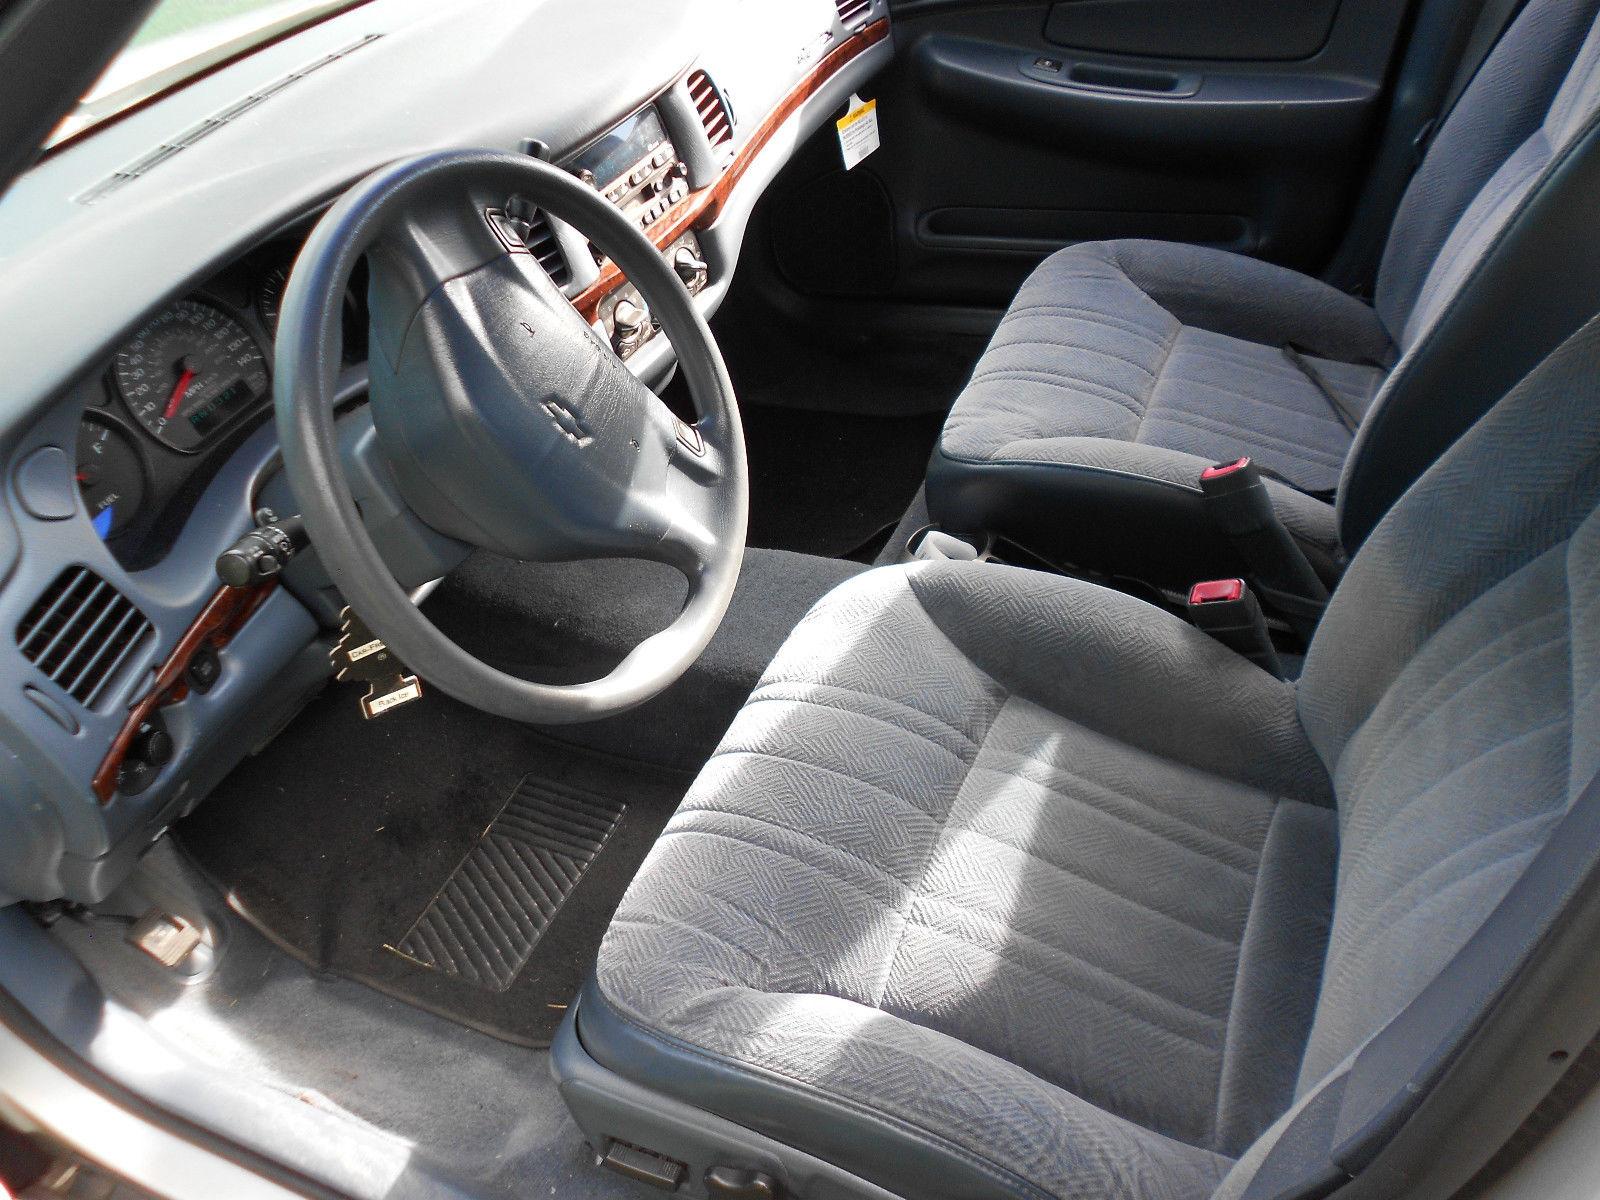 Daily Turismo 5k 9c1 Police Special 2002 Chevrolet Impala Sedan